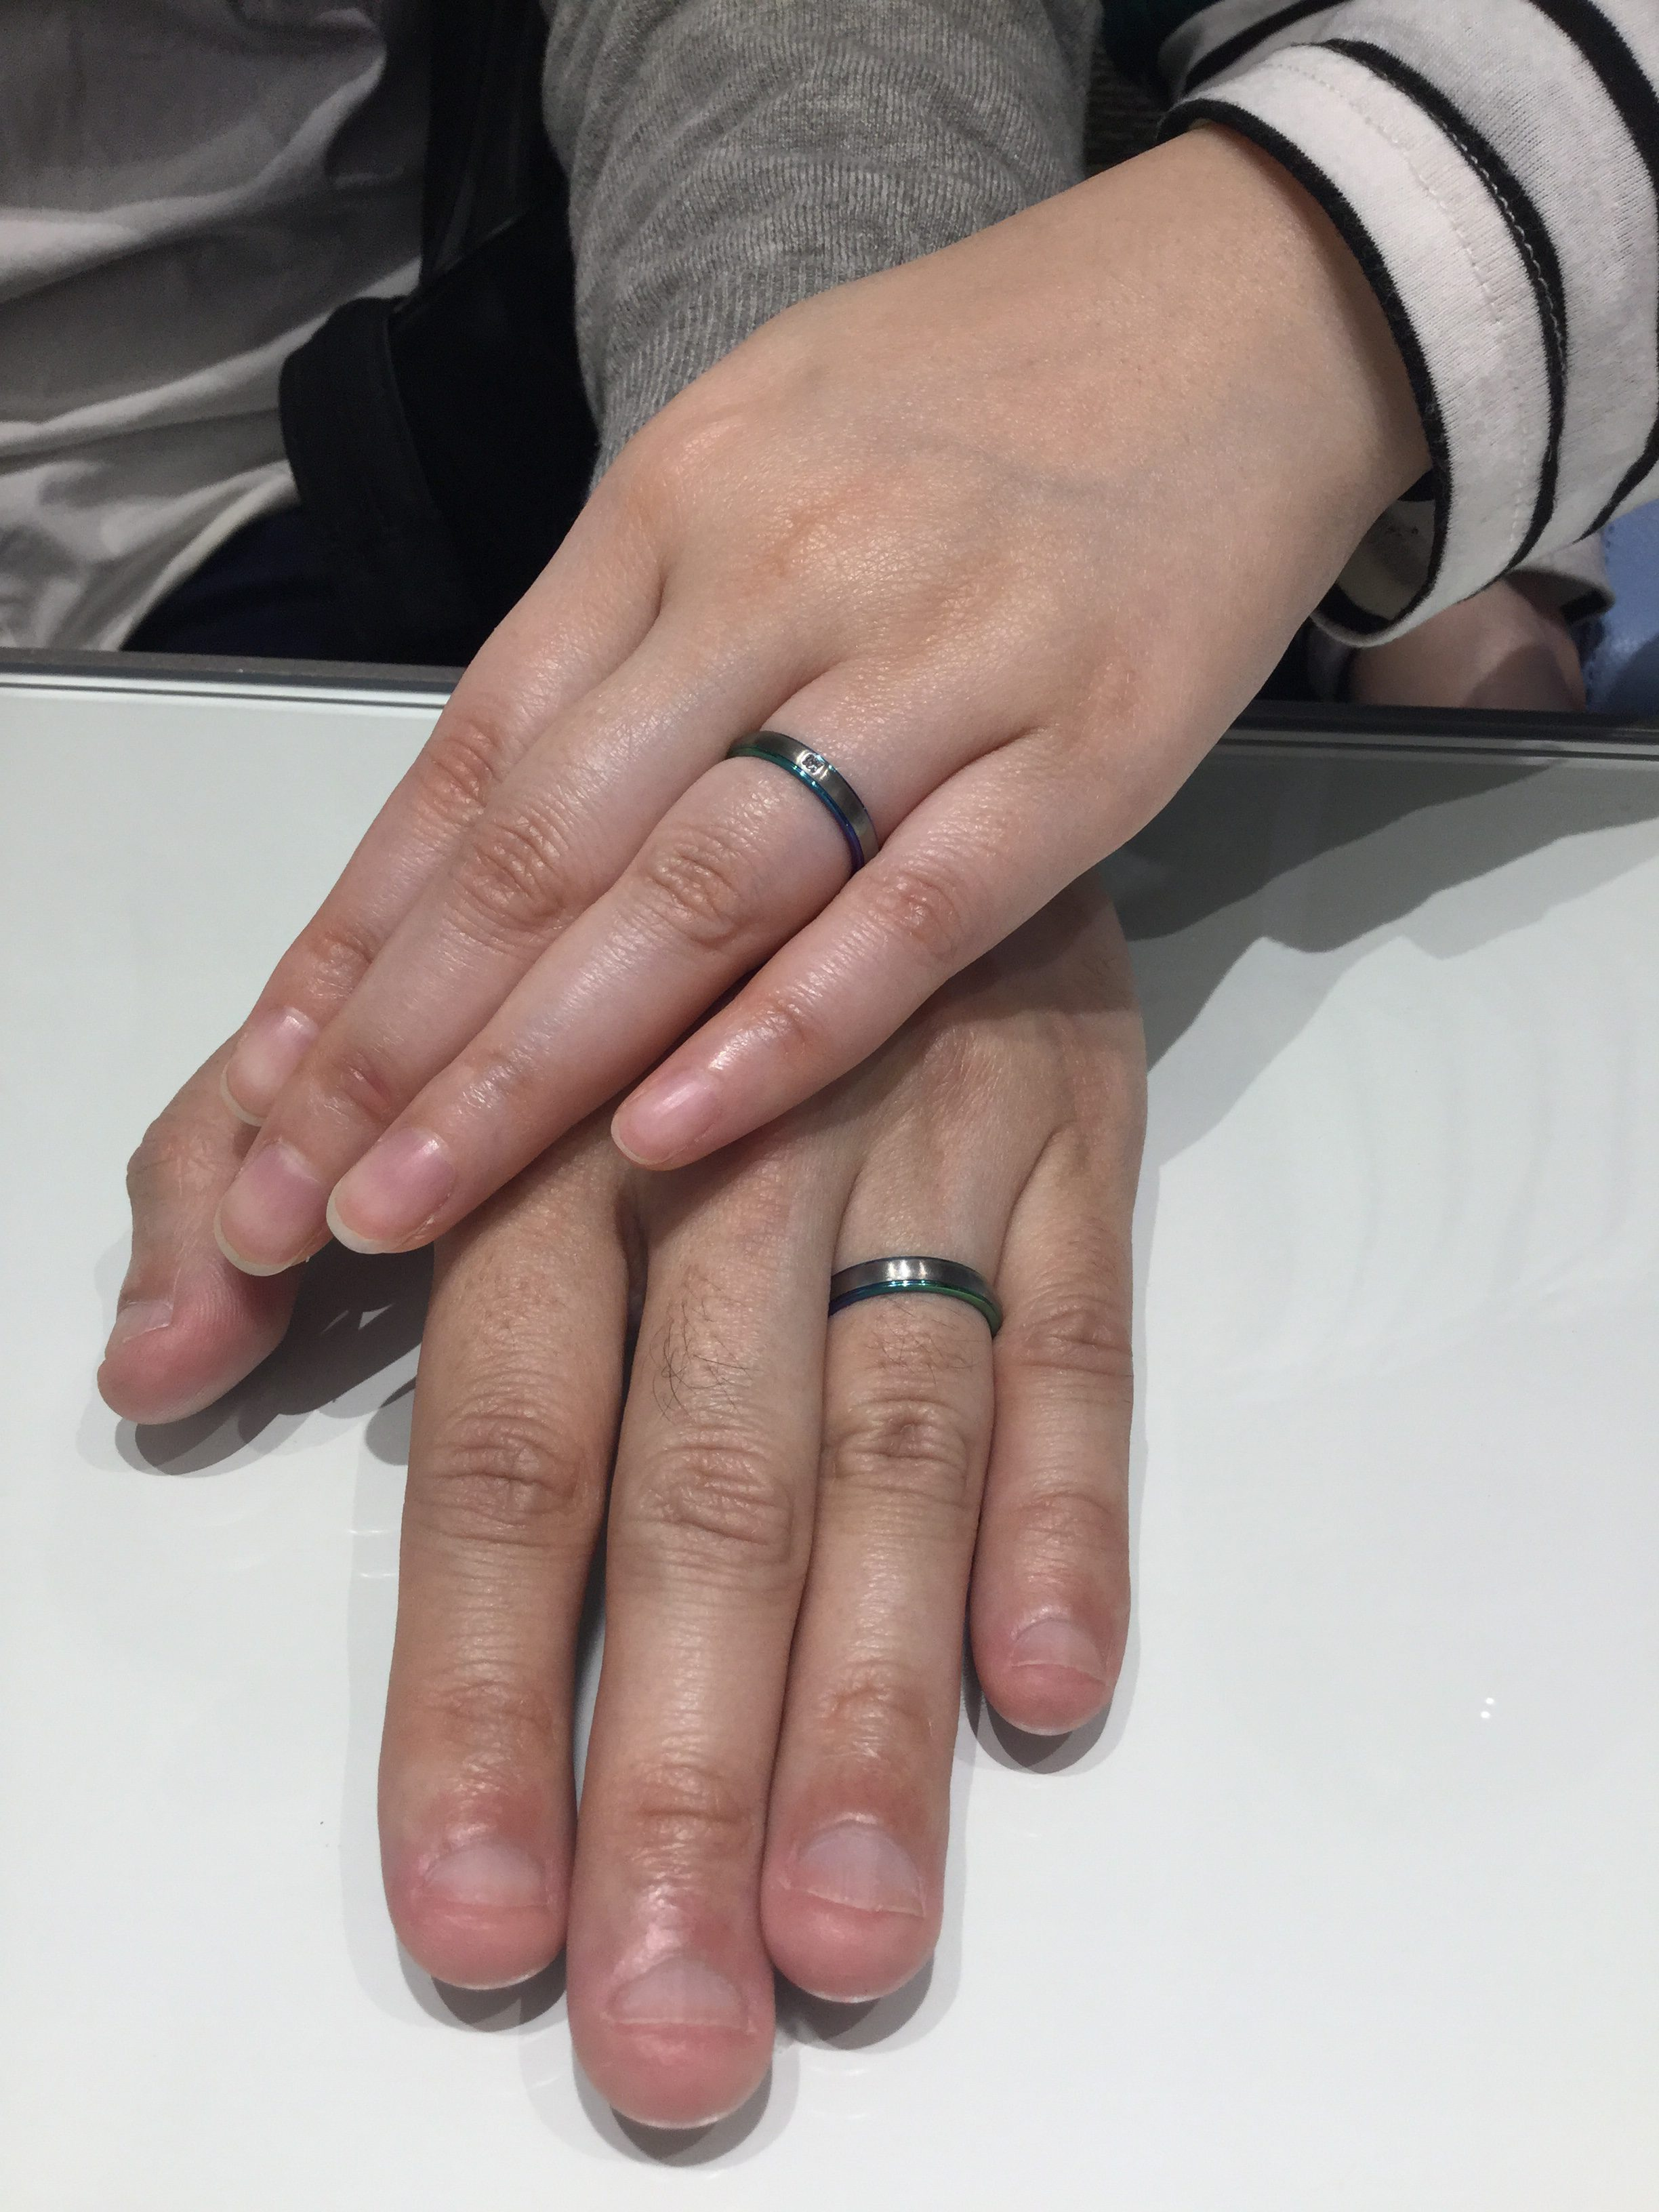 SORA(ソラ)の結婚指輪「ドーム」をオリジナルカラーで!(新潟市/H様・C様)